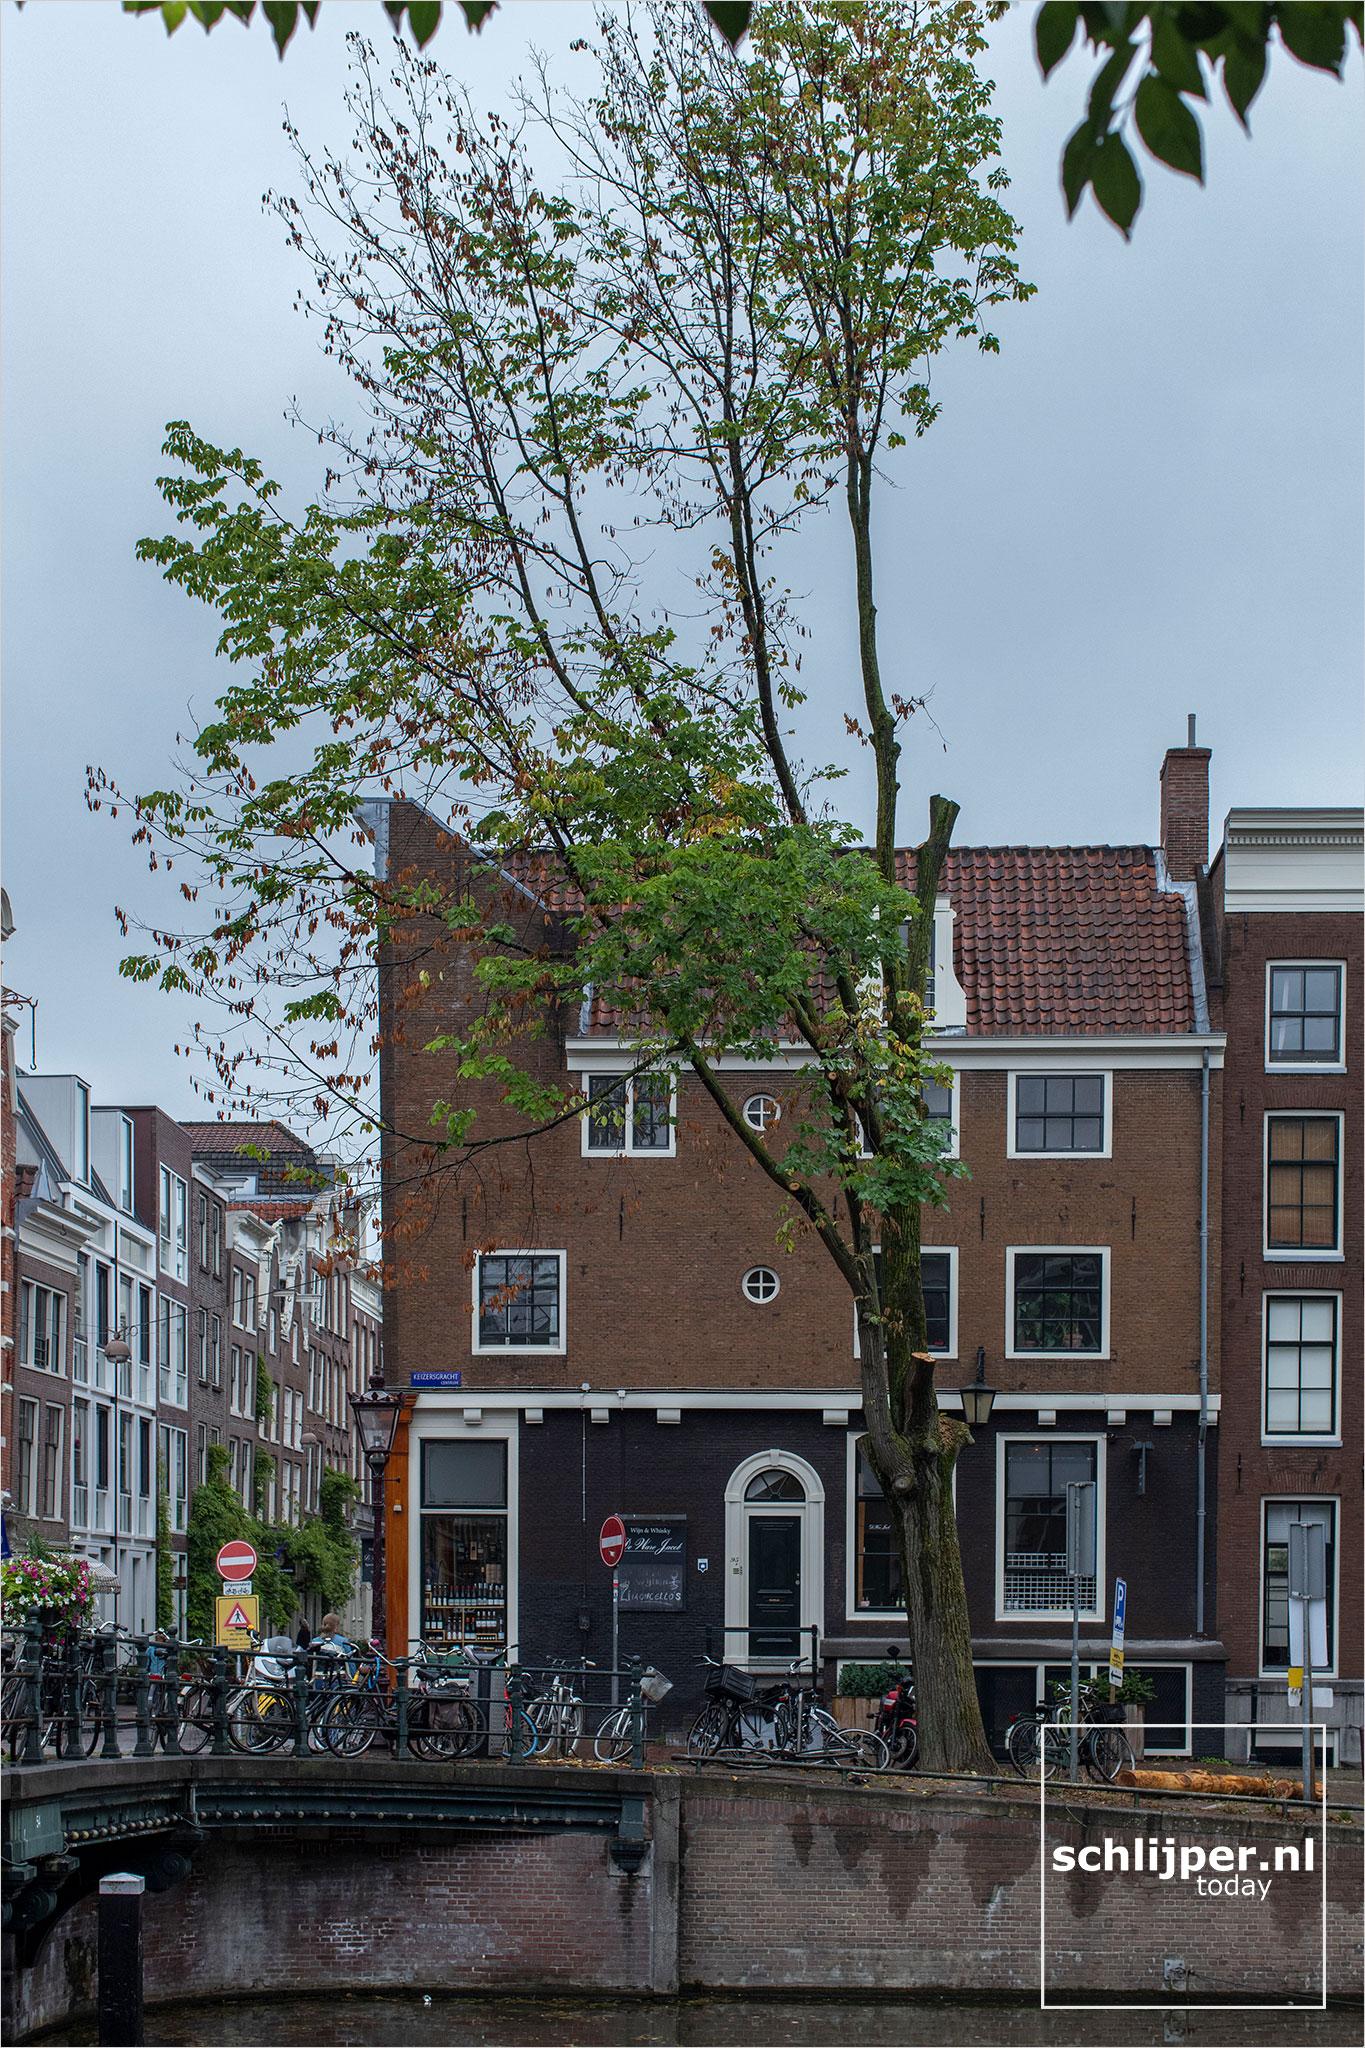 Nederland, Amsterdam, 8 juli 2020